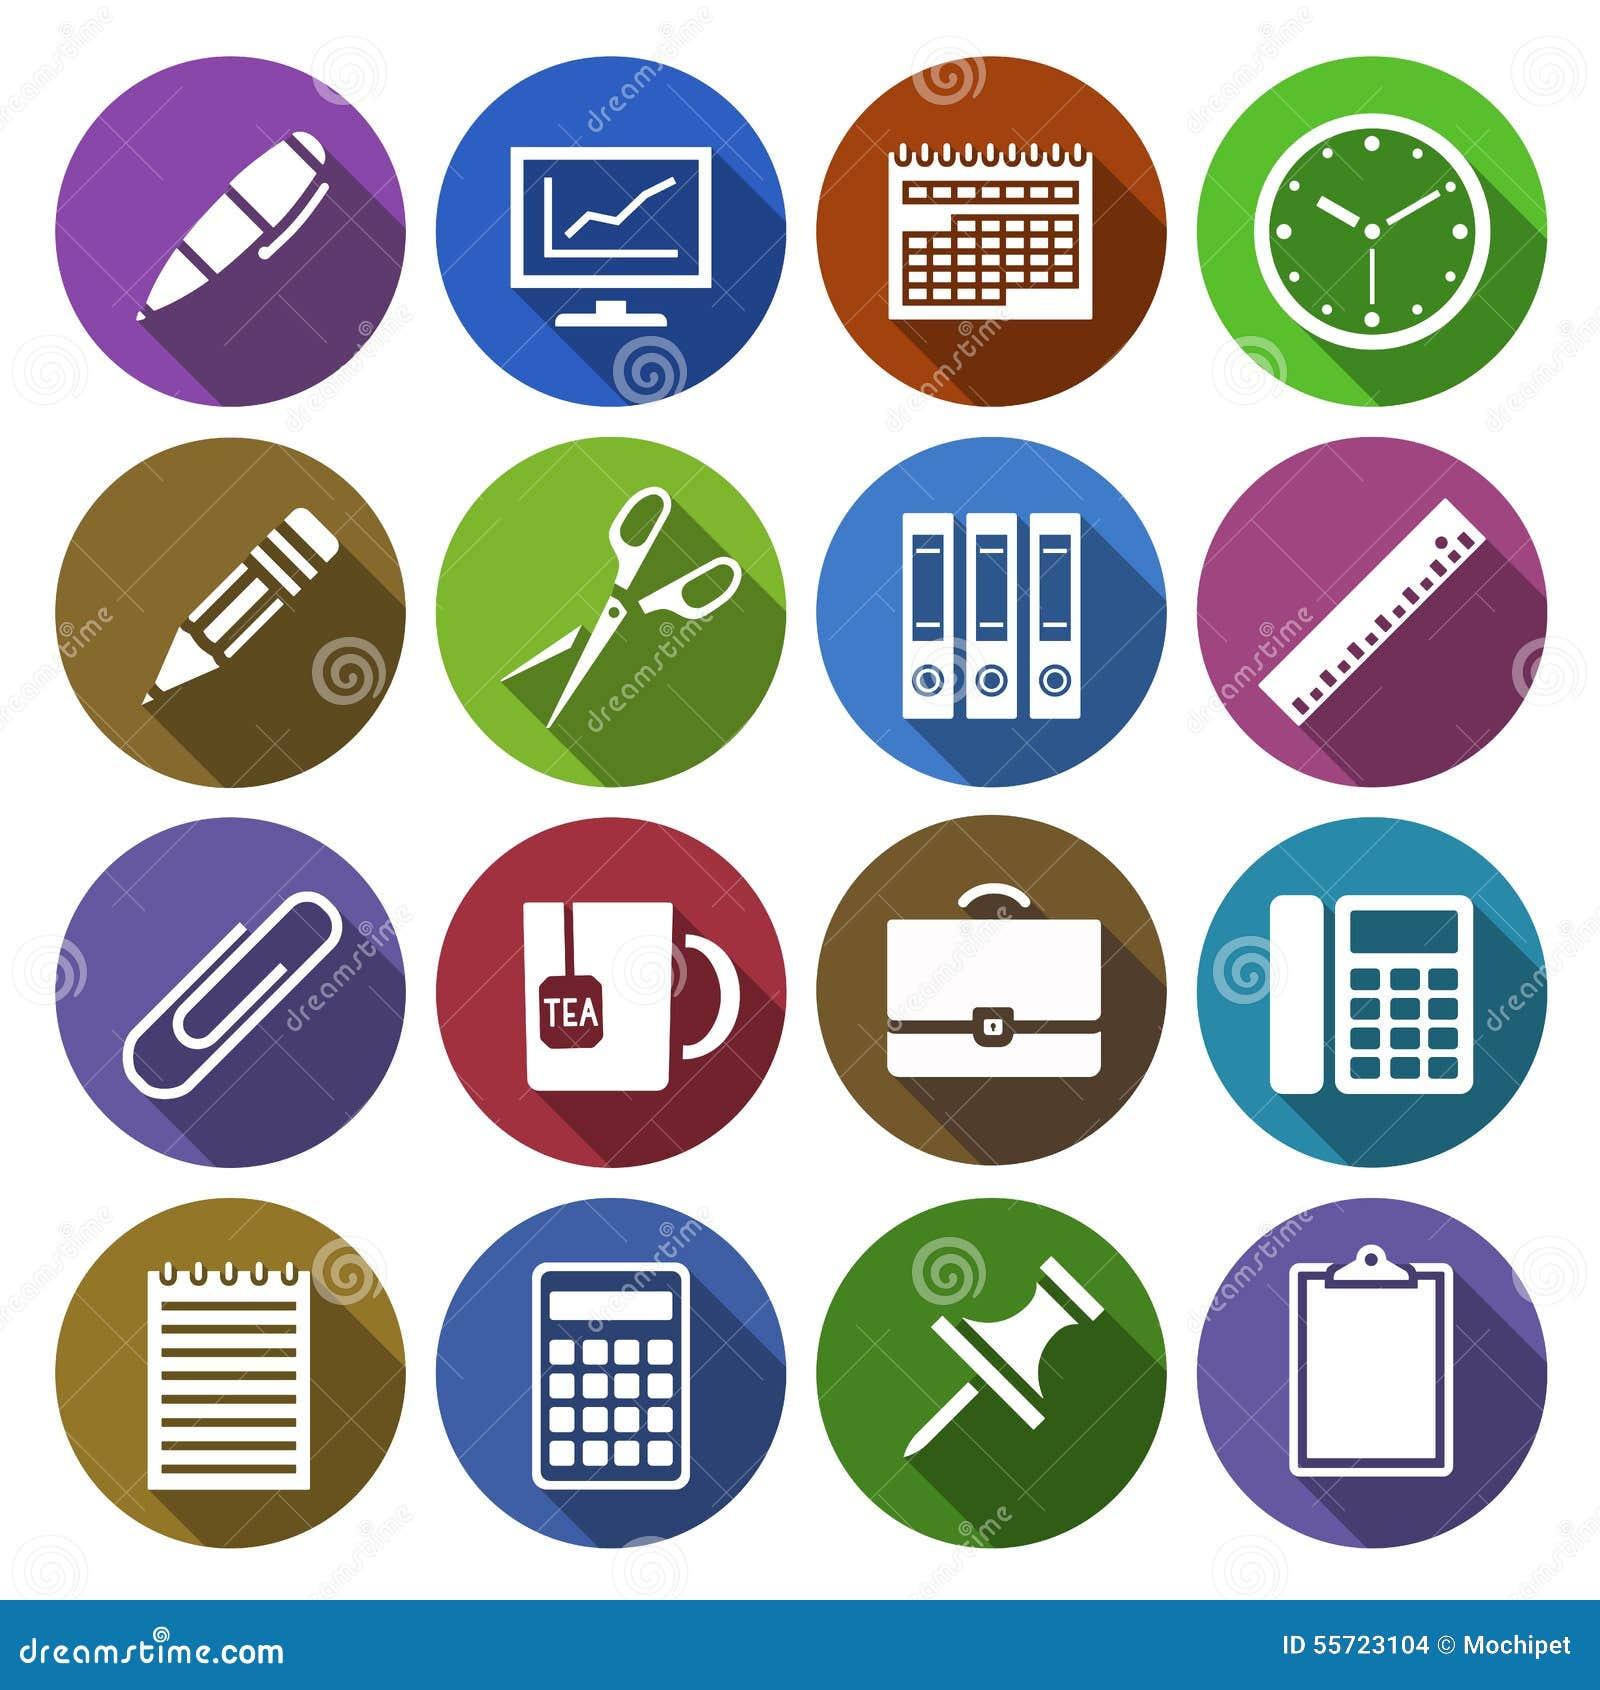 Icon of office supplies in flat design stock vector for Articulos de oficina